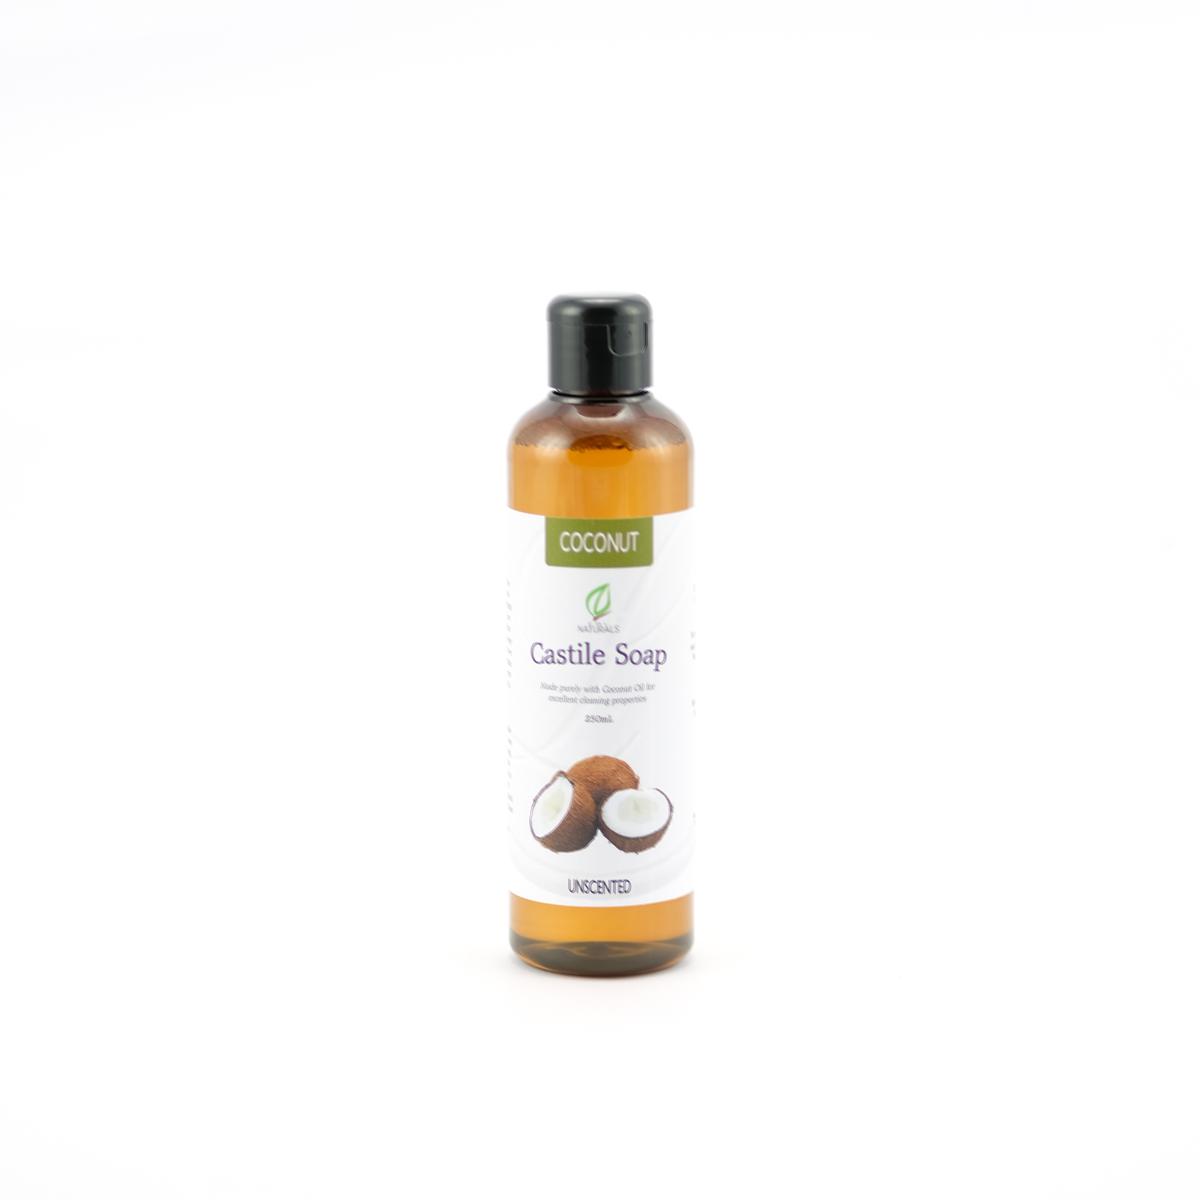 Unscented Coconut Castile Soap Refill